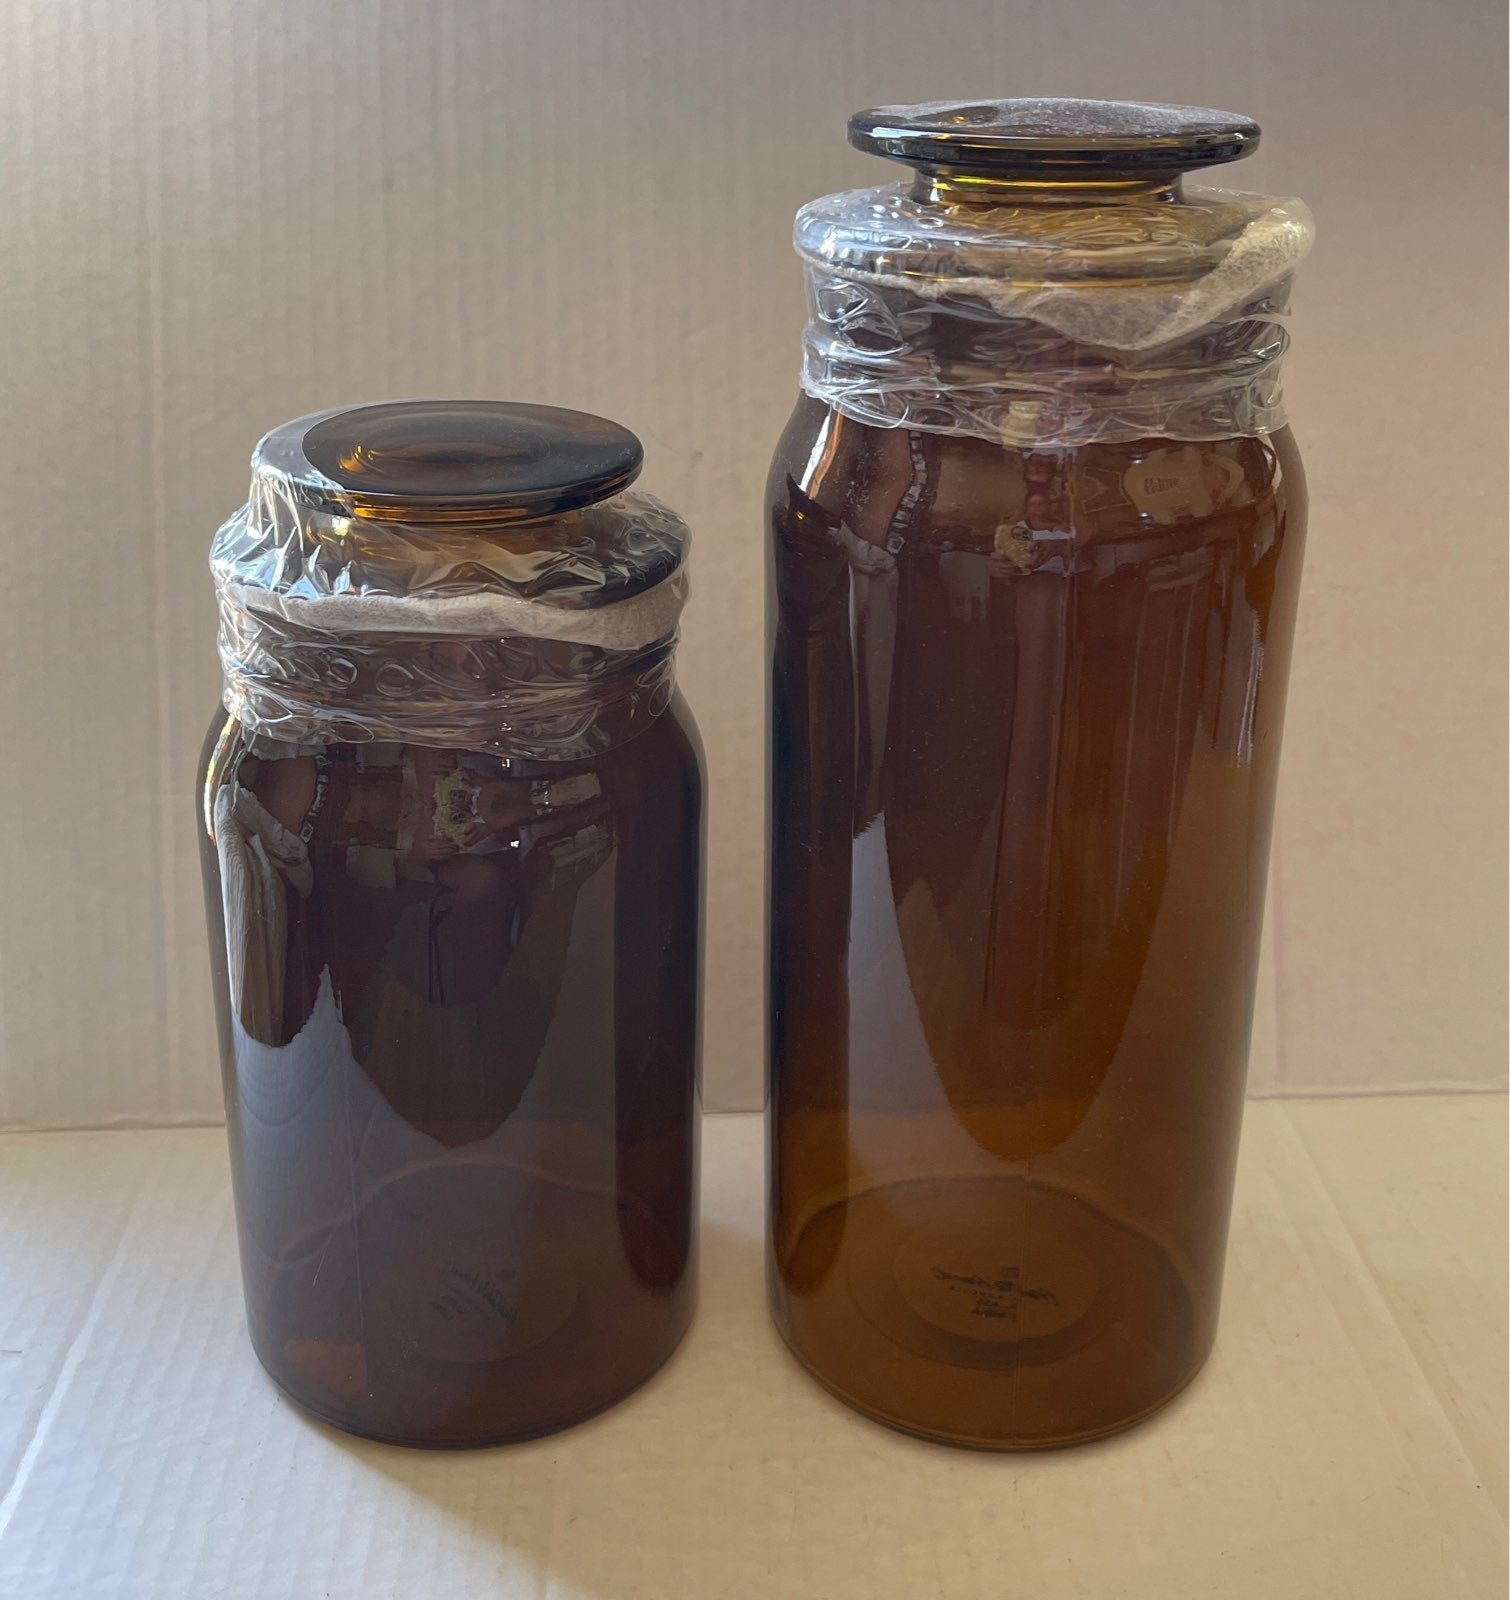 hearth and hand with Magnolia amber jars